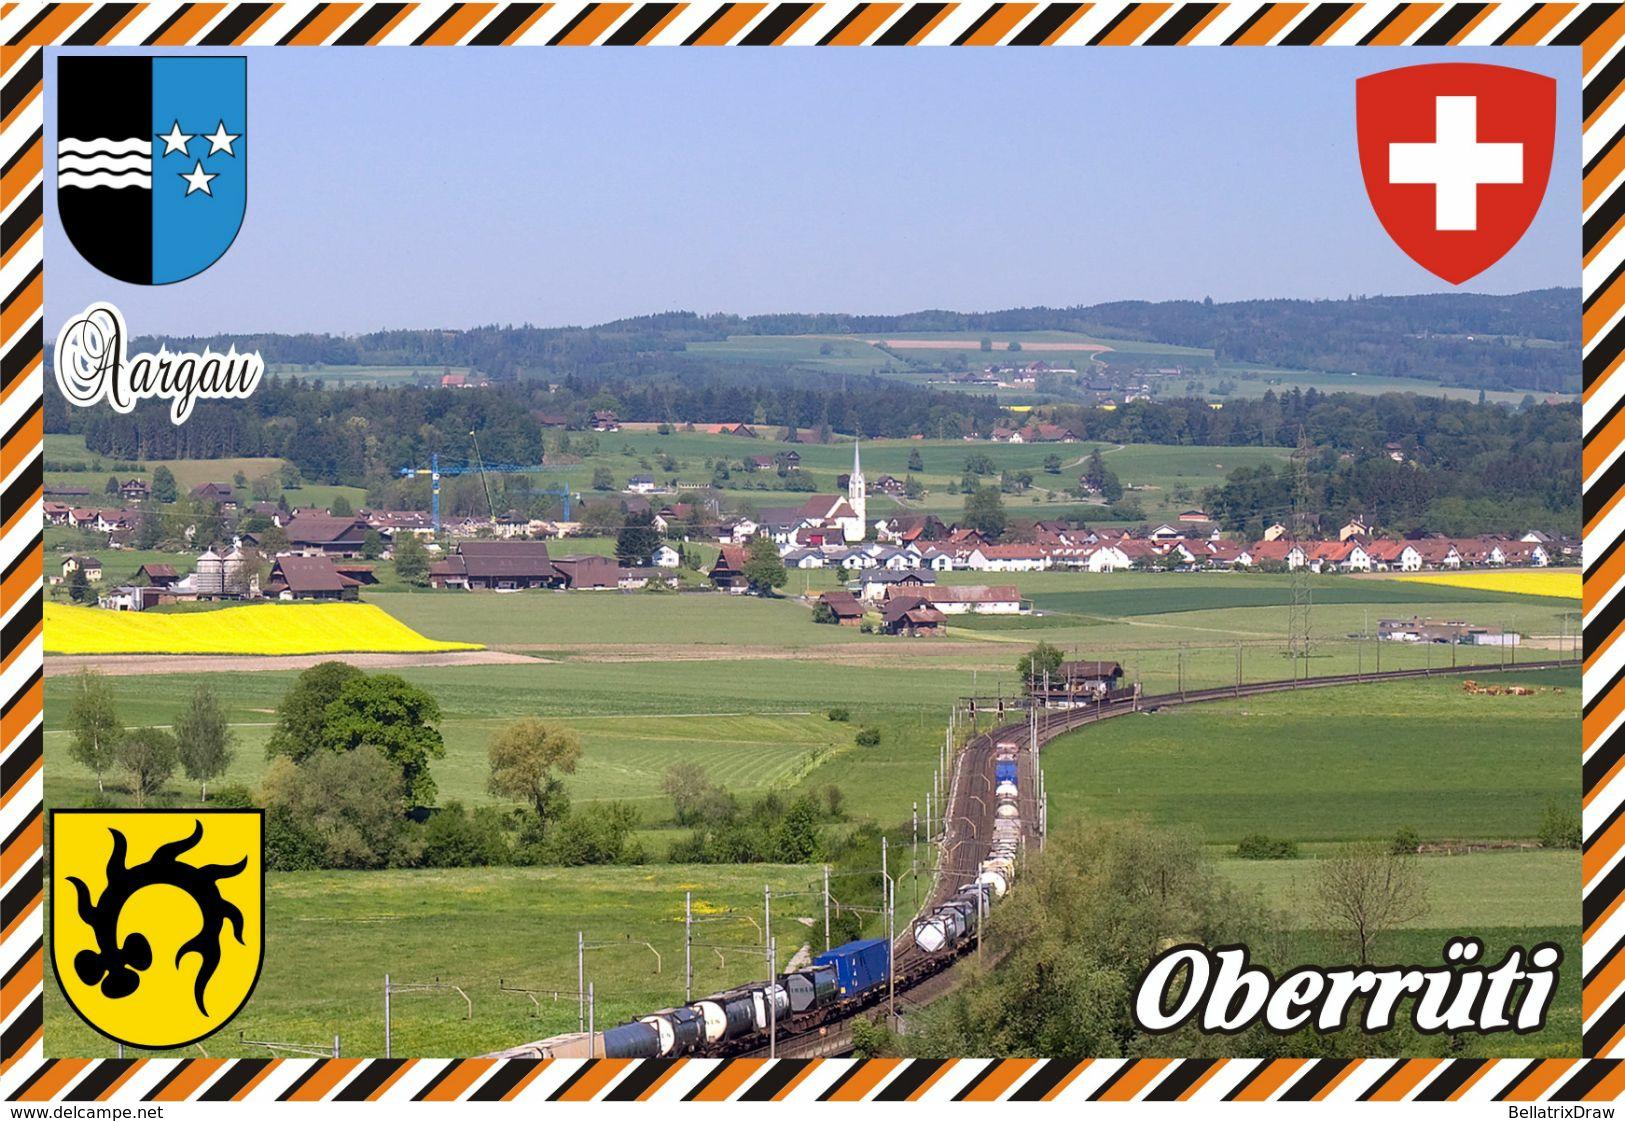 Postcard, REPRODUCTION, Switzerland, Canton Aargau, Oberrüti - Landkaarten